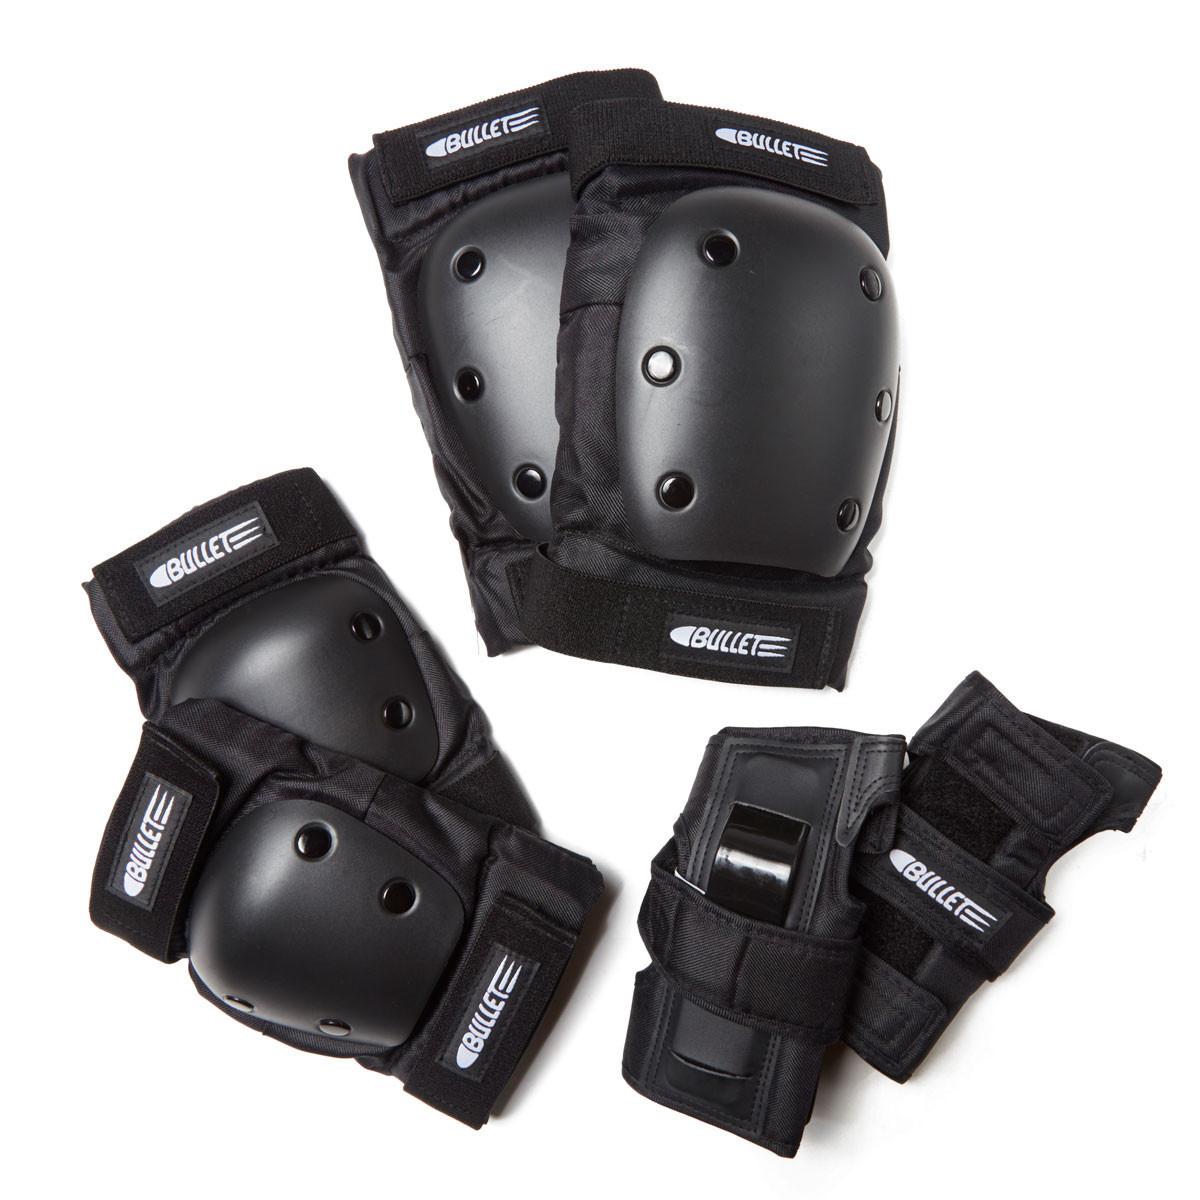 bullet junior black sets